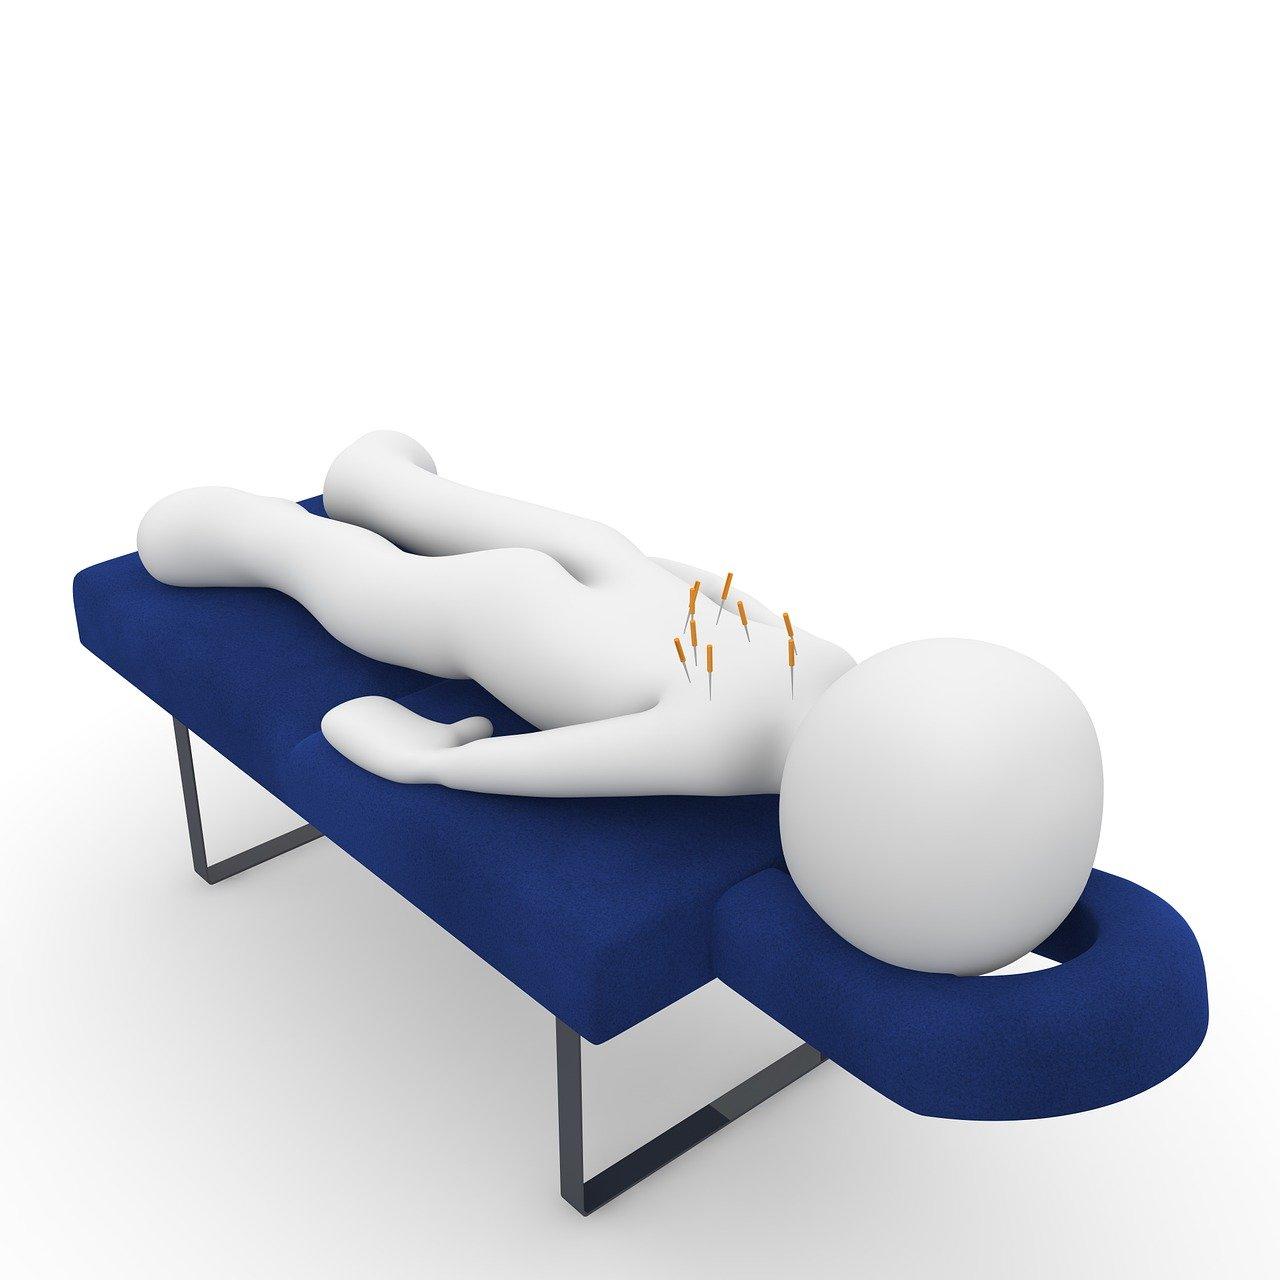 FITALIS Fysiotherapie & Training fysiotherapie kosten